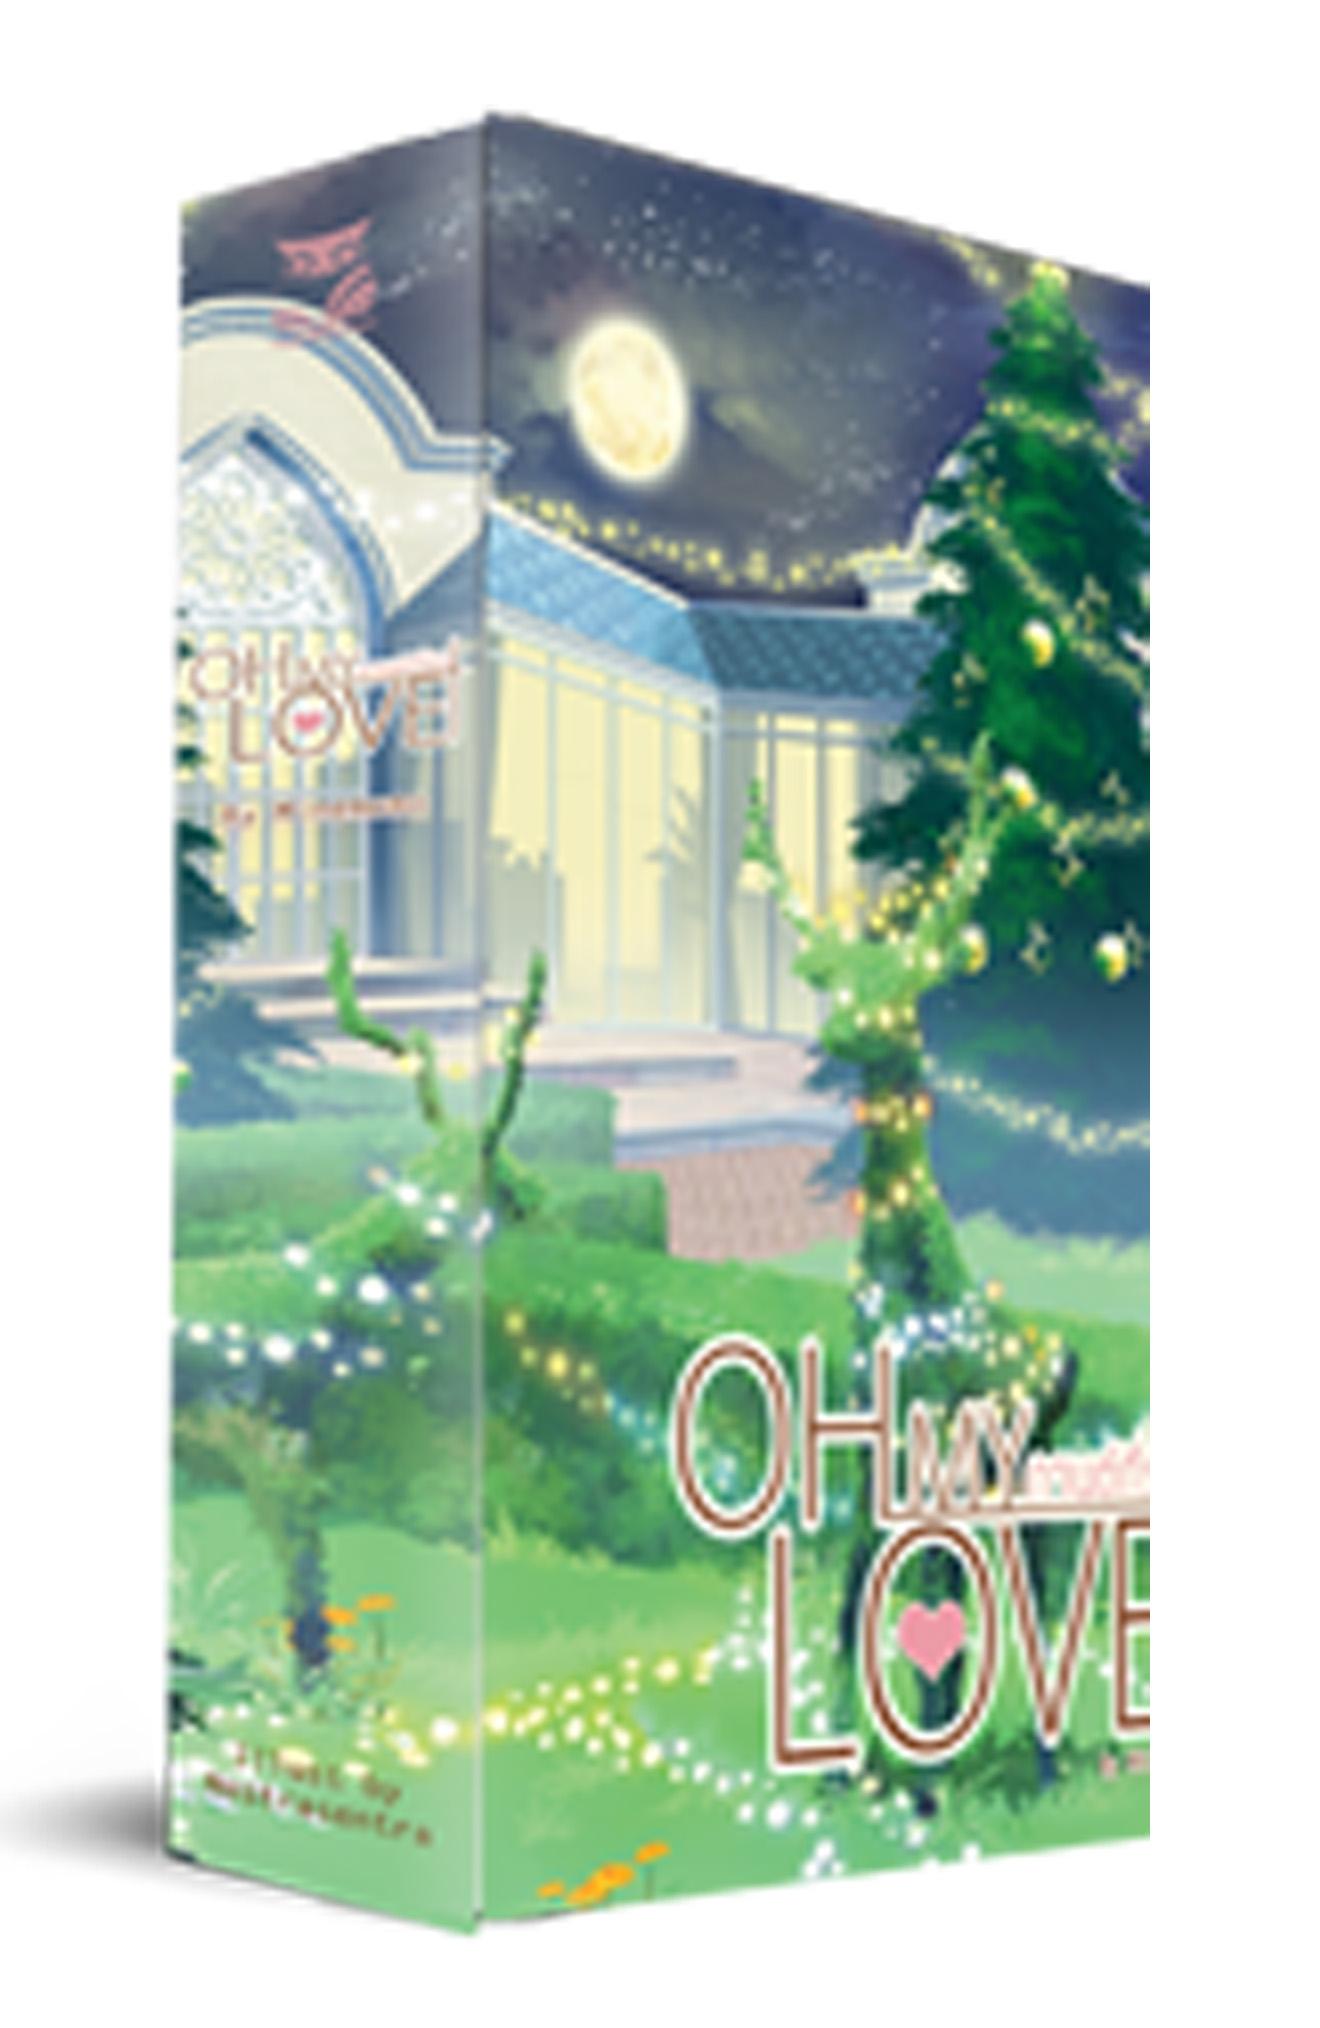 [Boxset] Oh my love กานต์ที่รัก เขียน minemomo